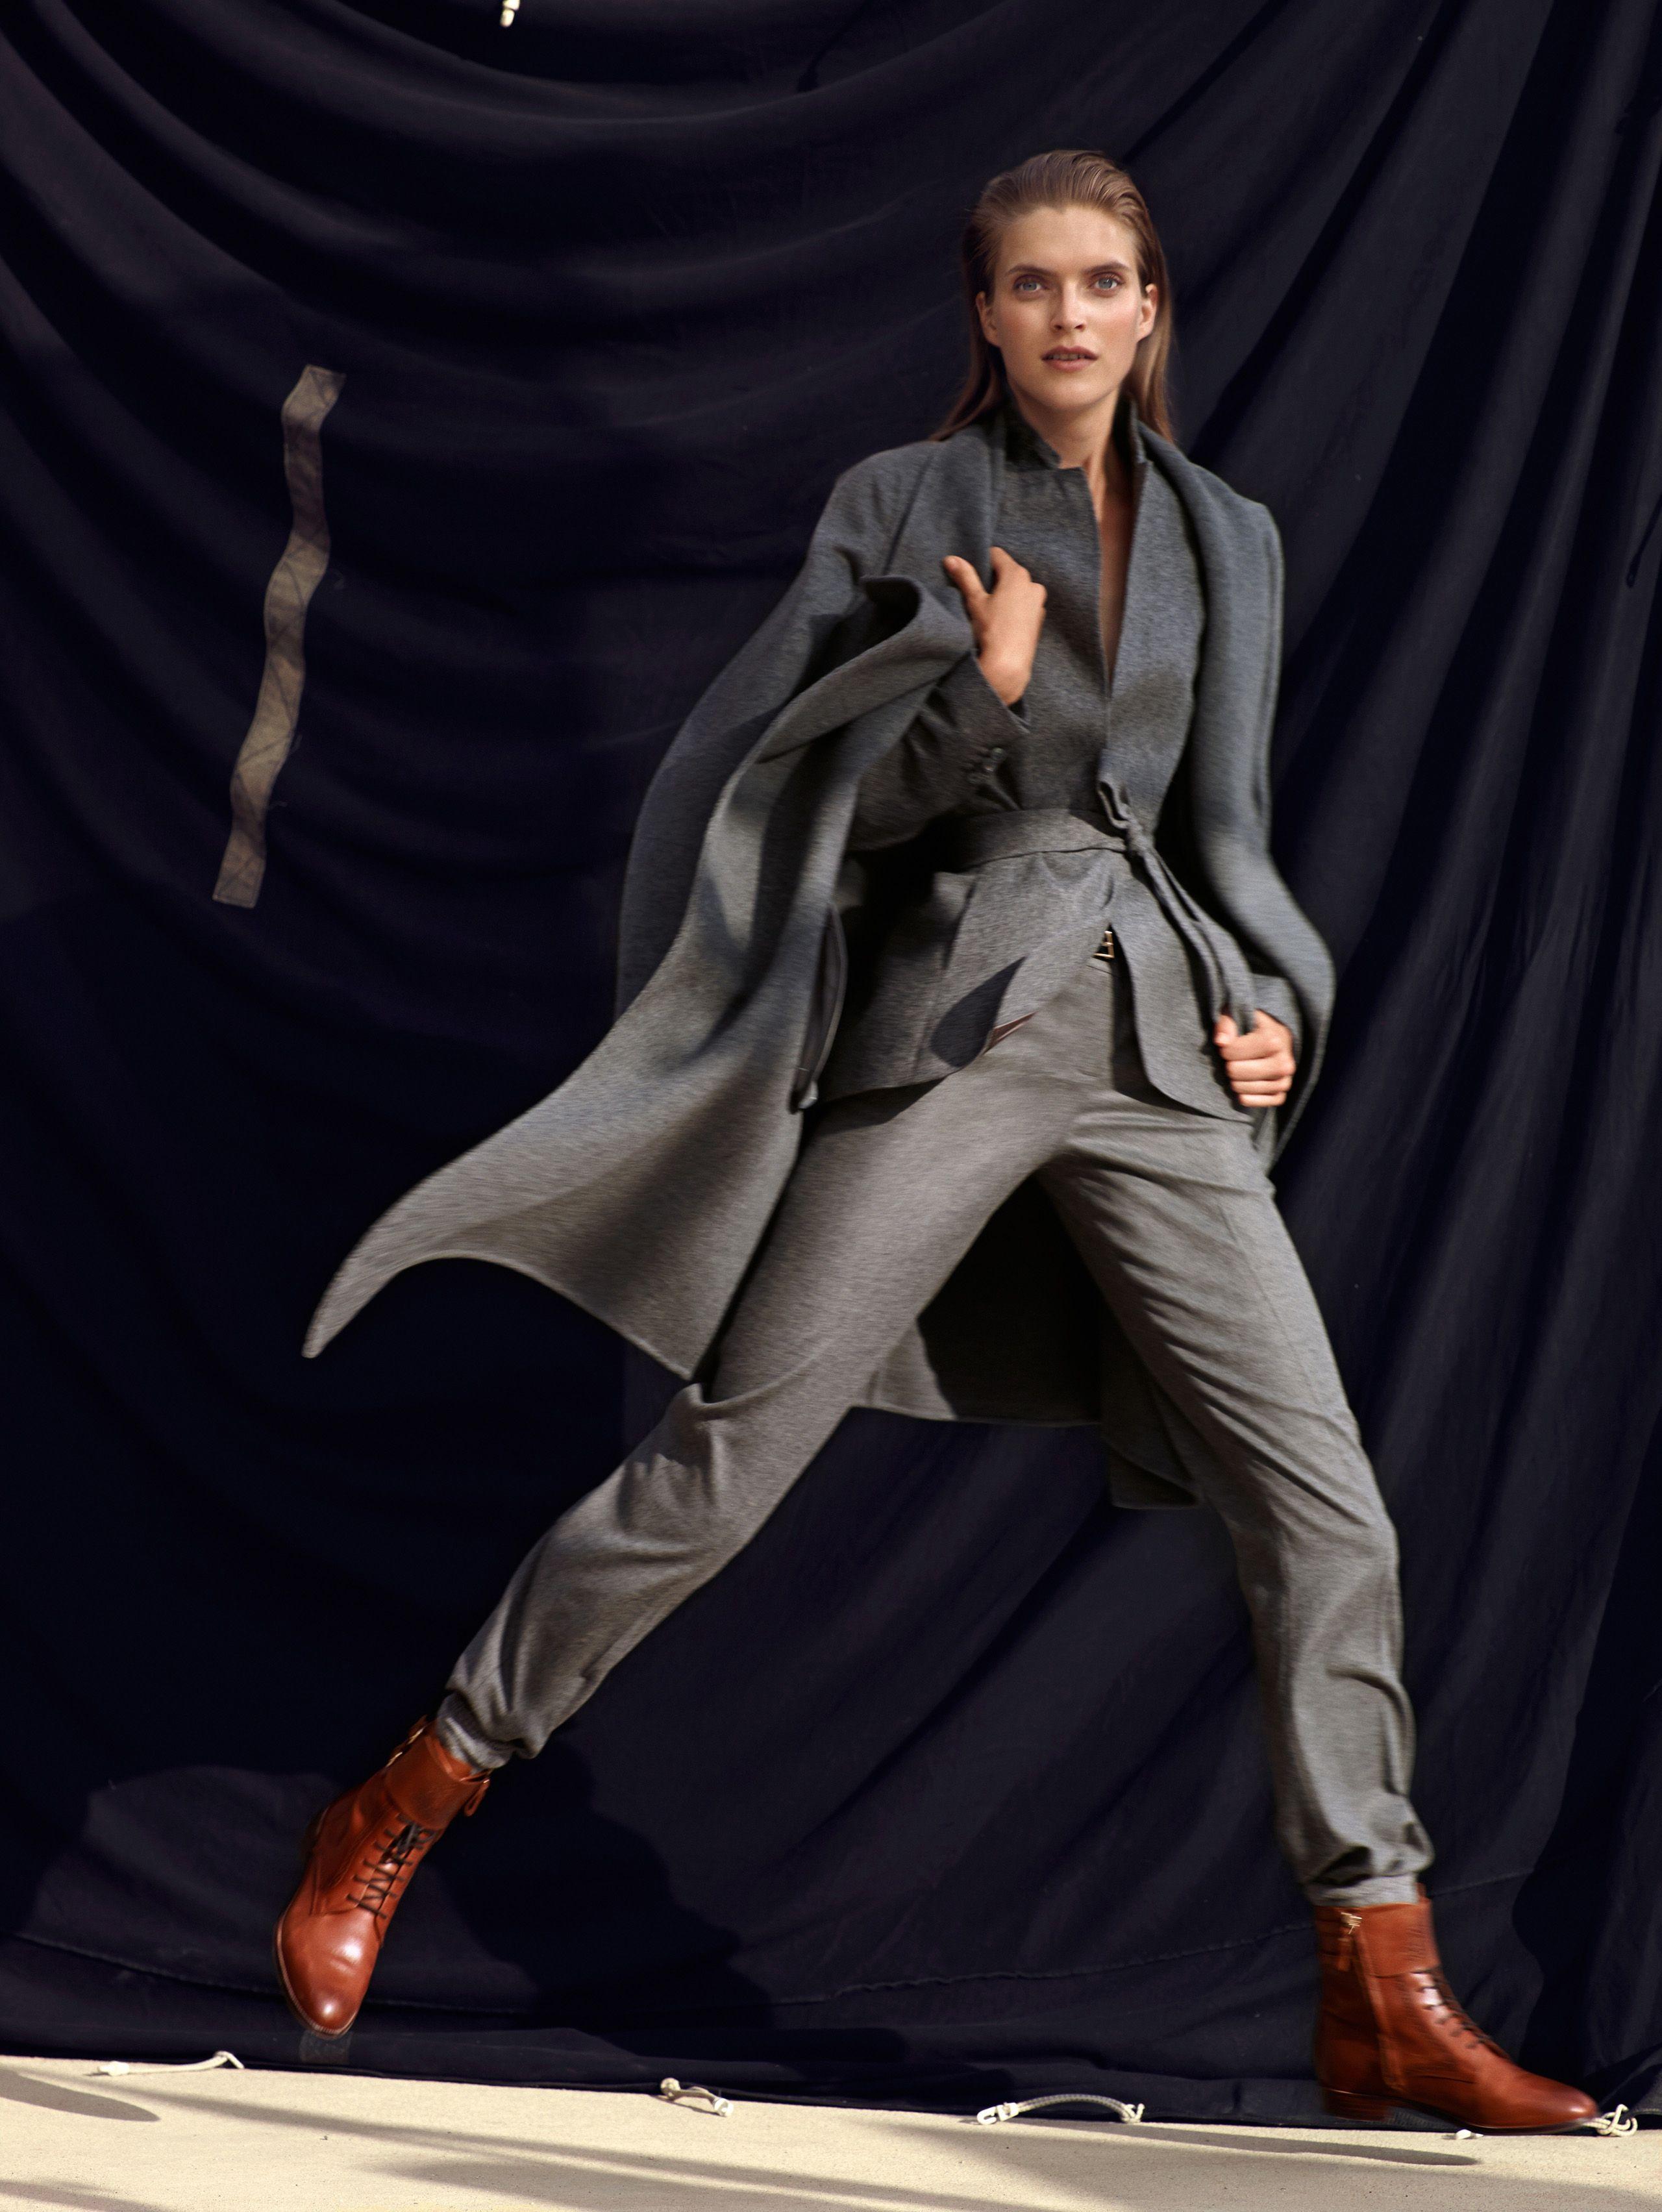 Massimo Dutti October 2014 Lookbook Goes Urban Chic forecasting